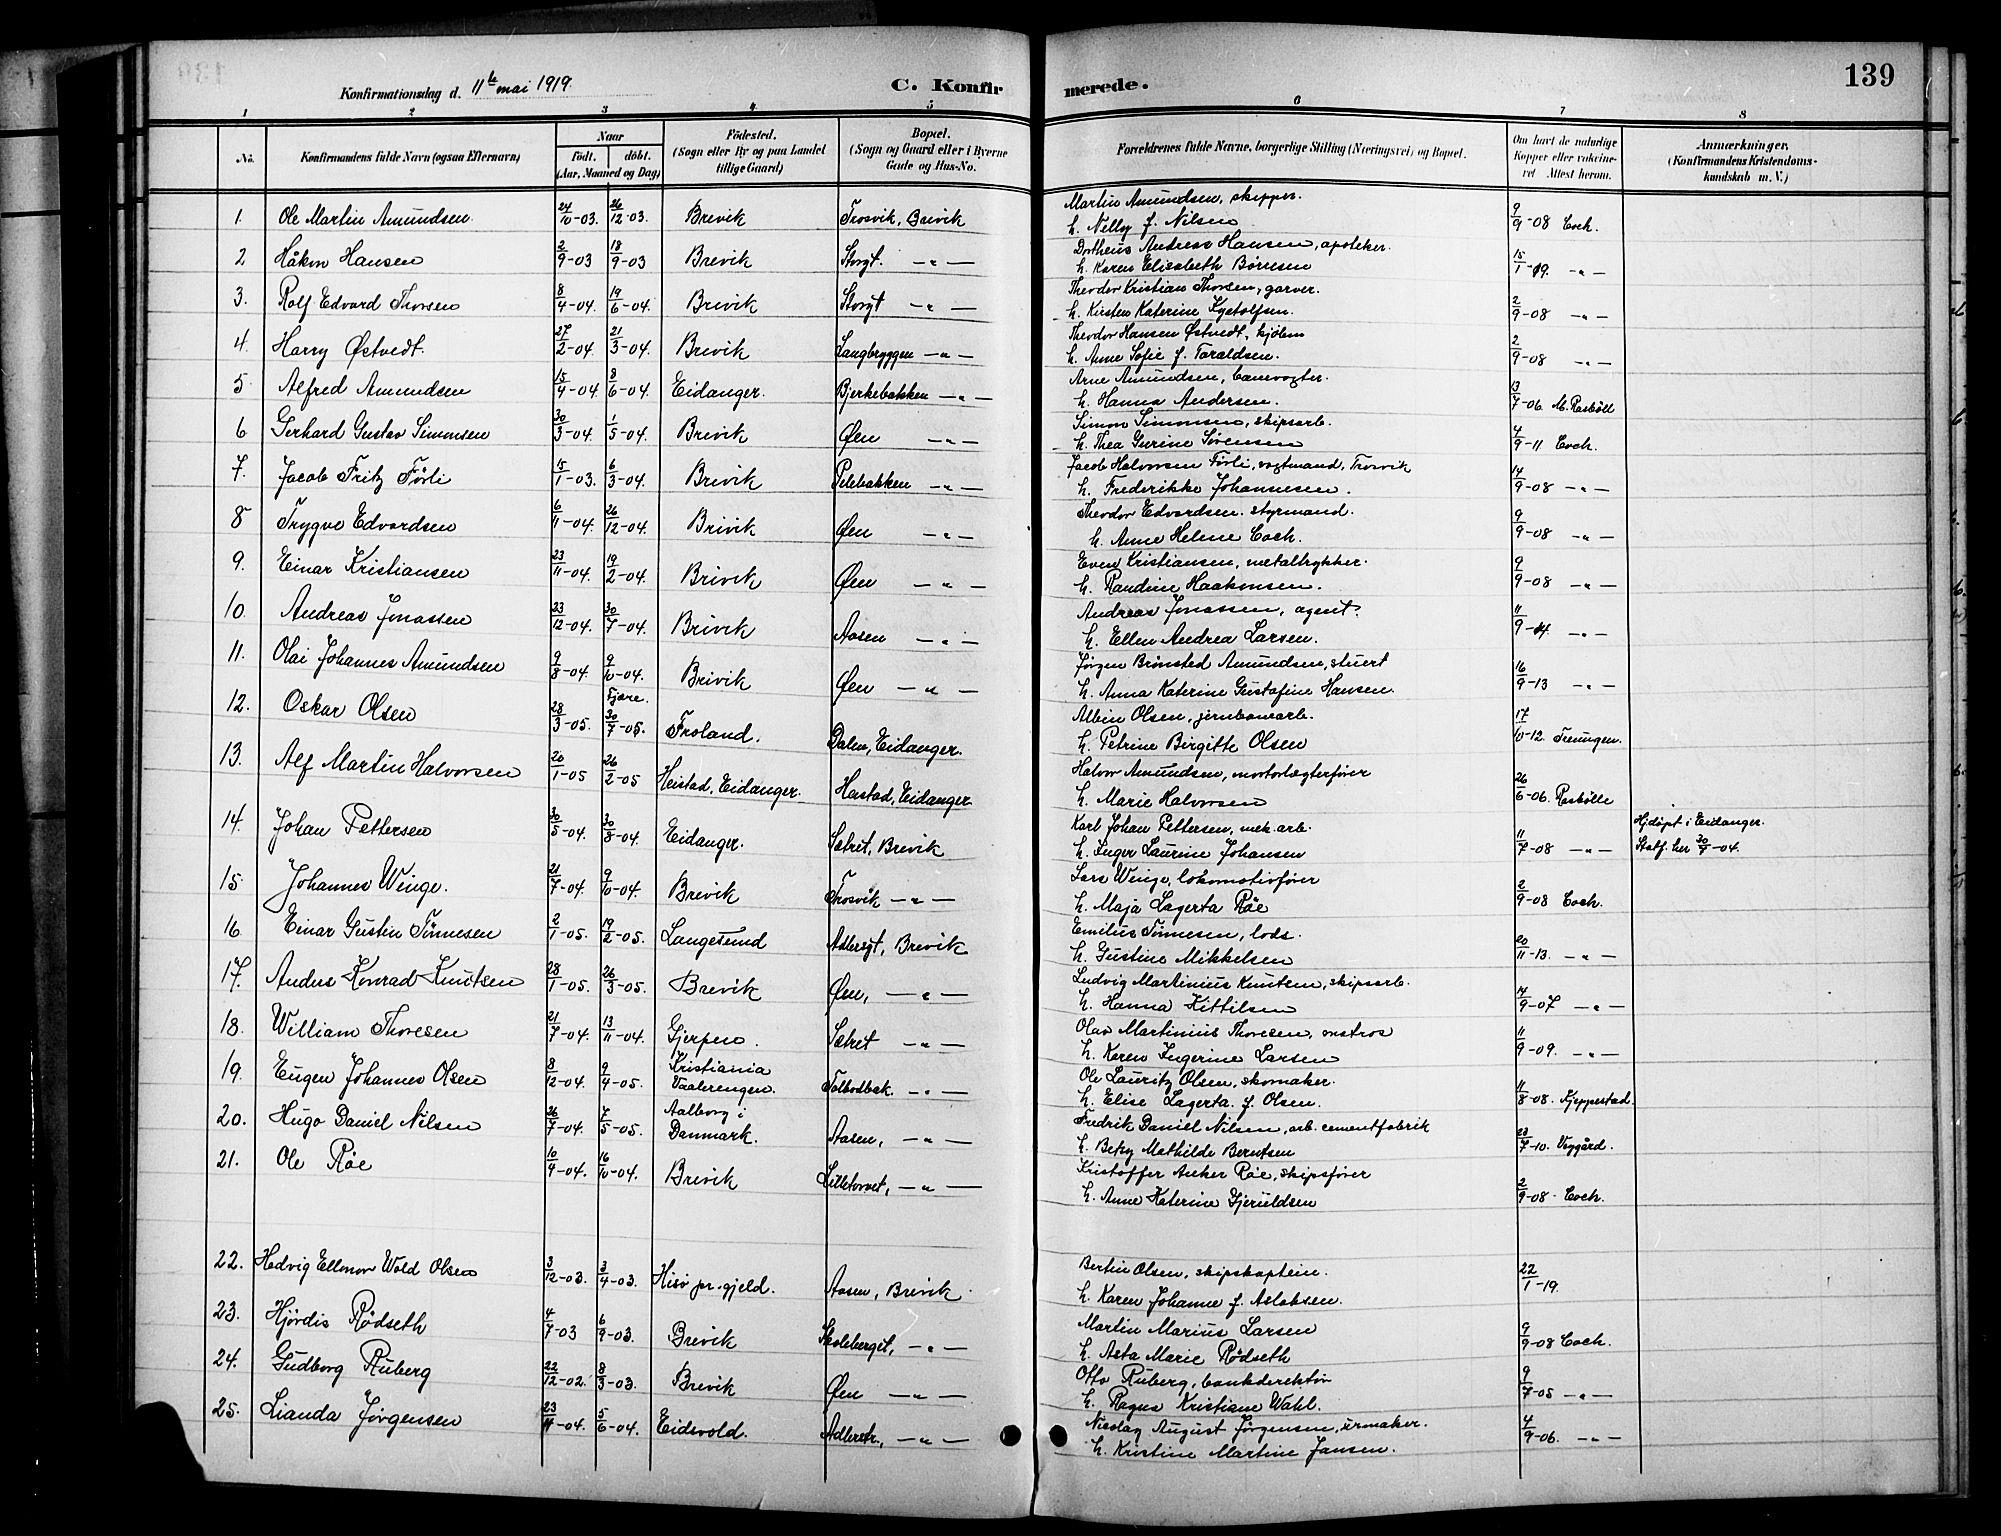 SAKO, Brevik kirkebøker, G/Ga/L0005: Klokkerbok nr. 5, 1901-1924, s. 139